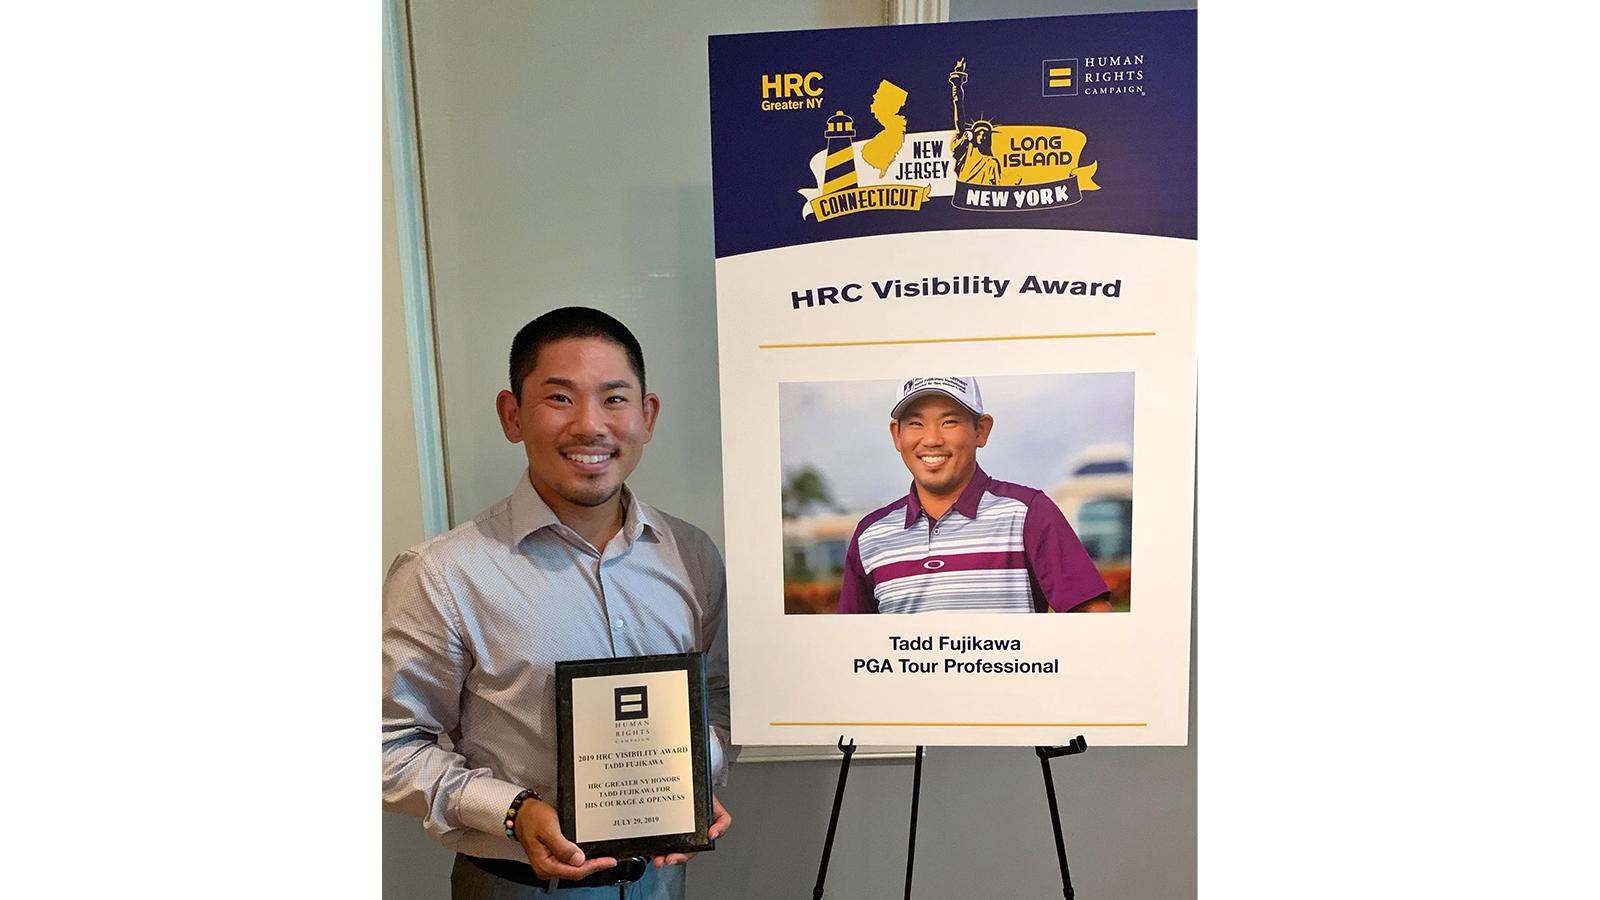 Tadd Fujikawa: Golfing for Equality